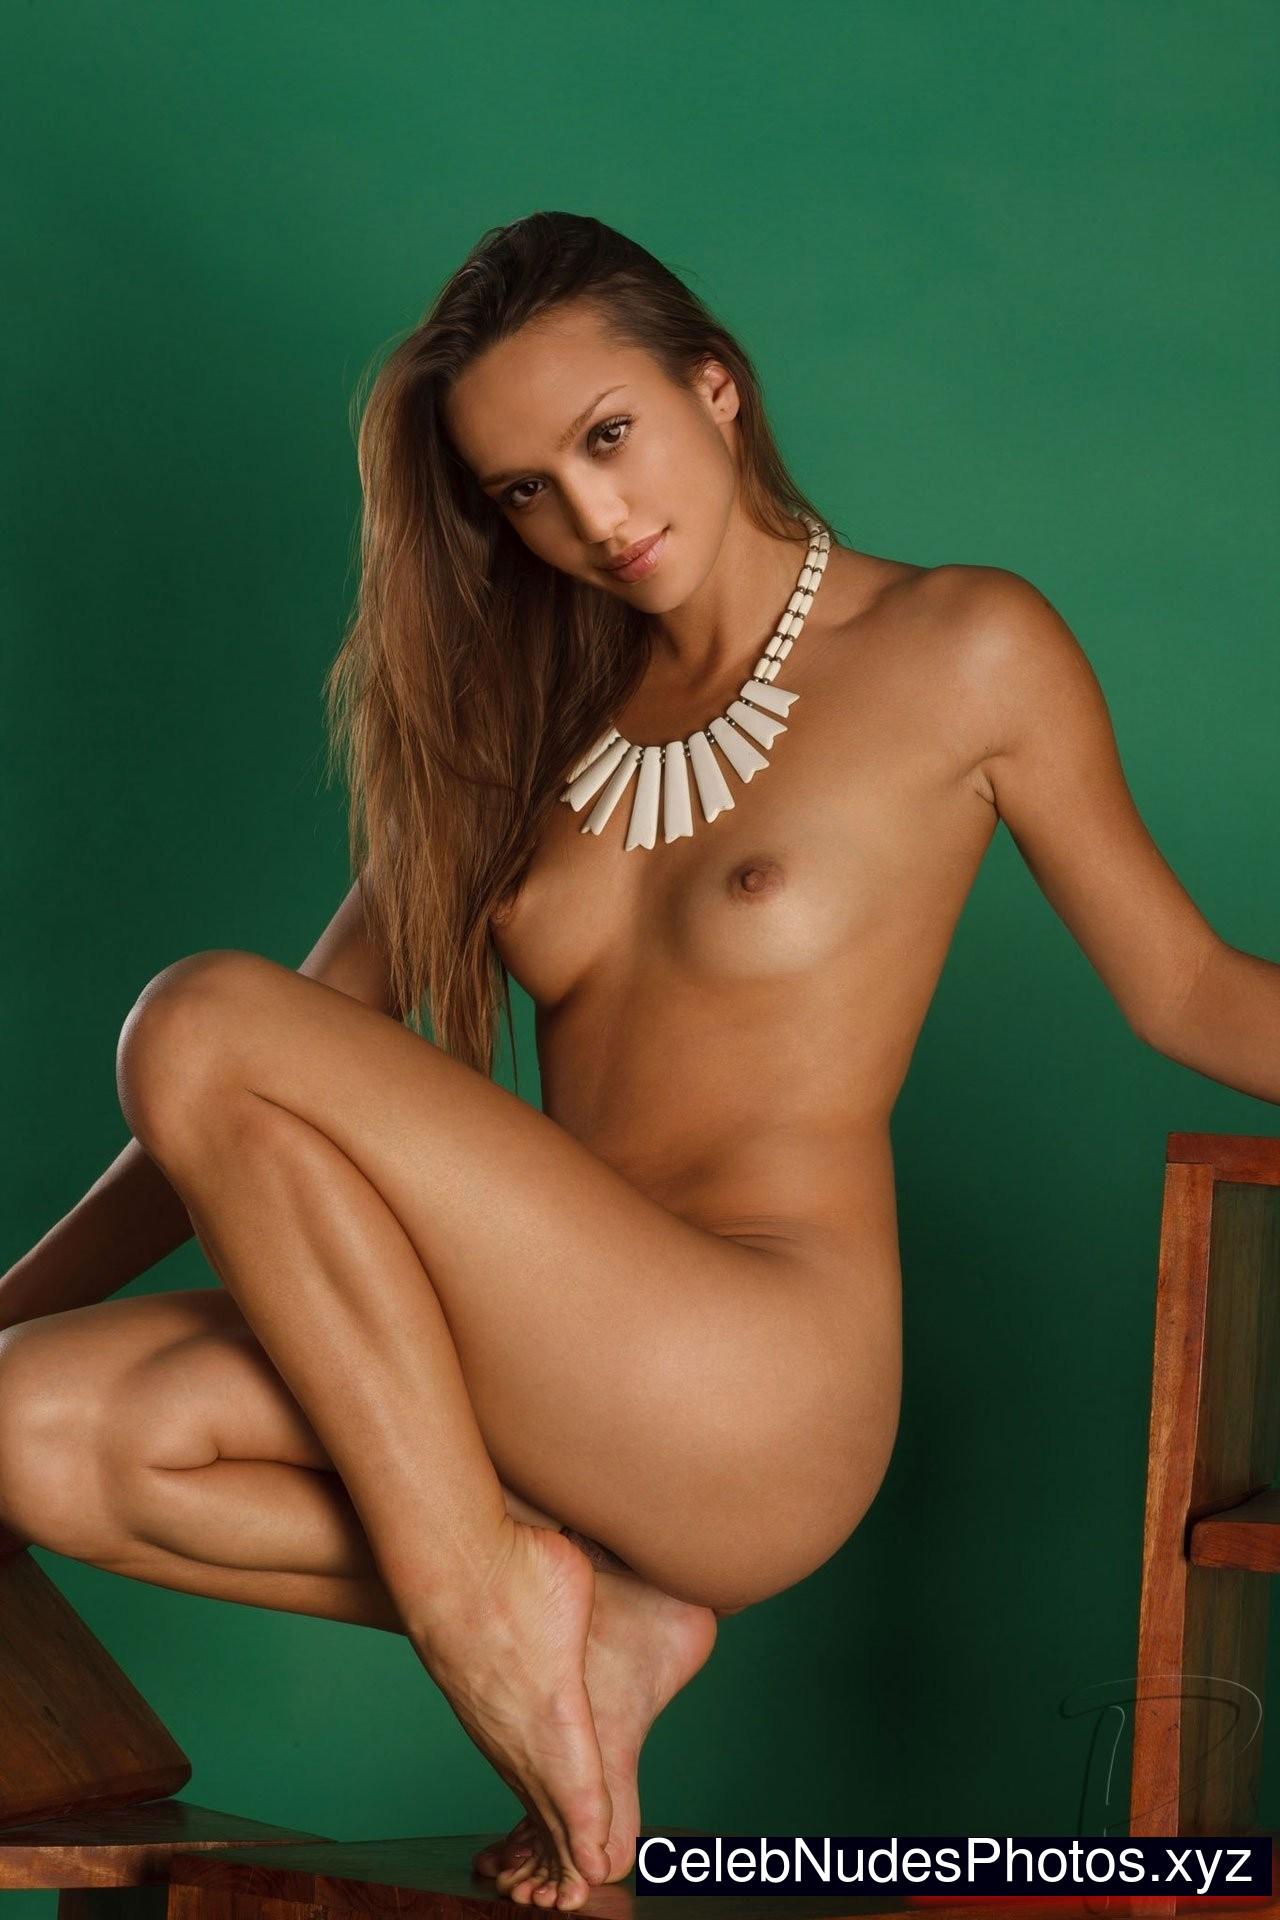 Very pity Jessica alba naked so real